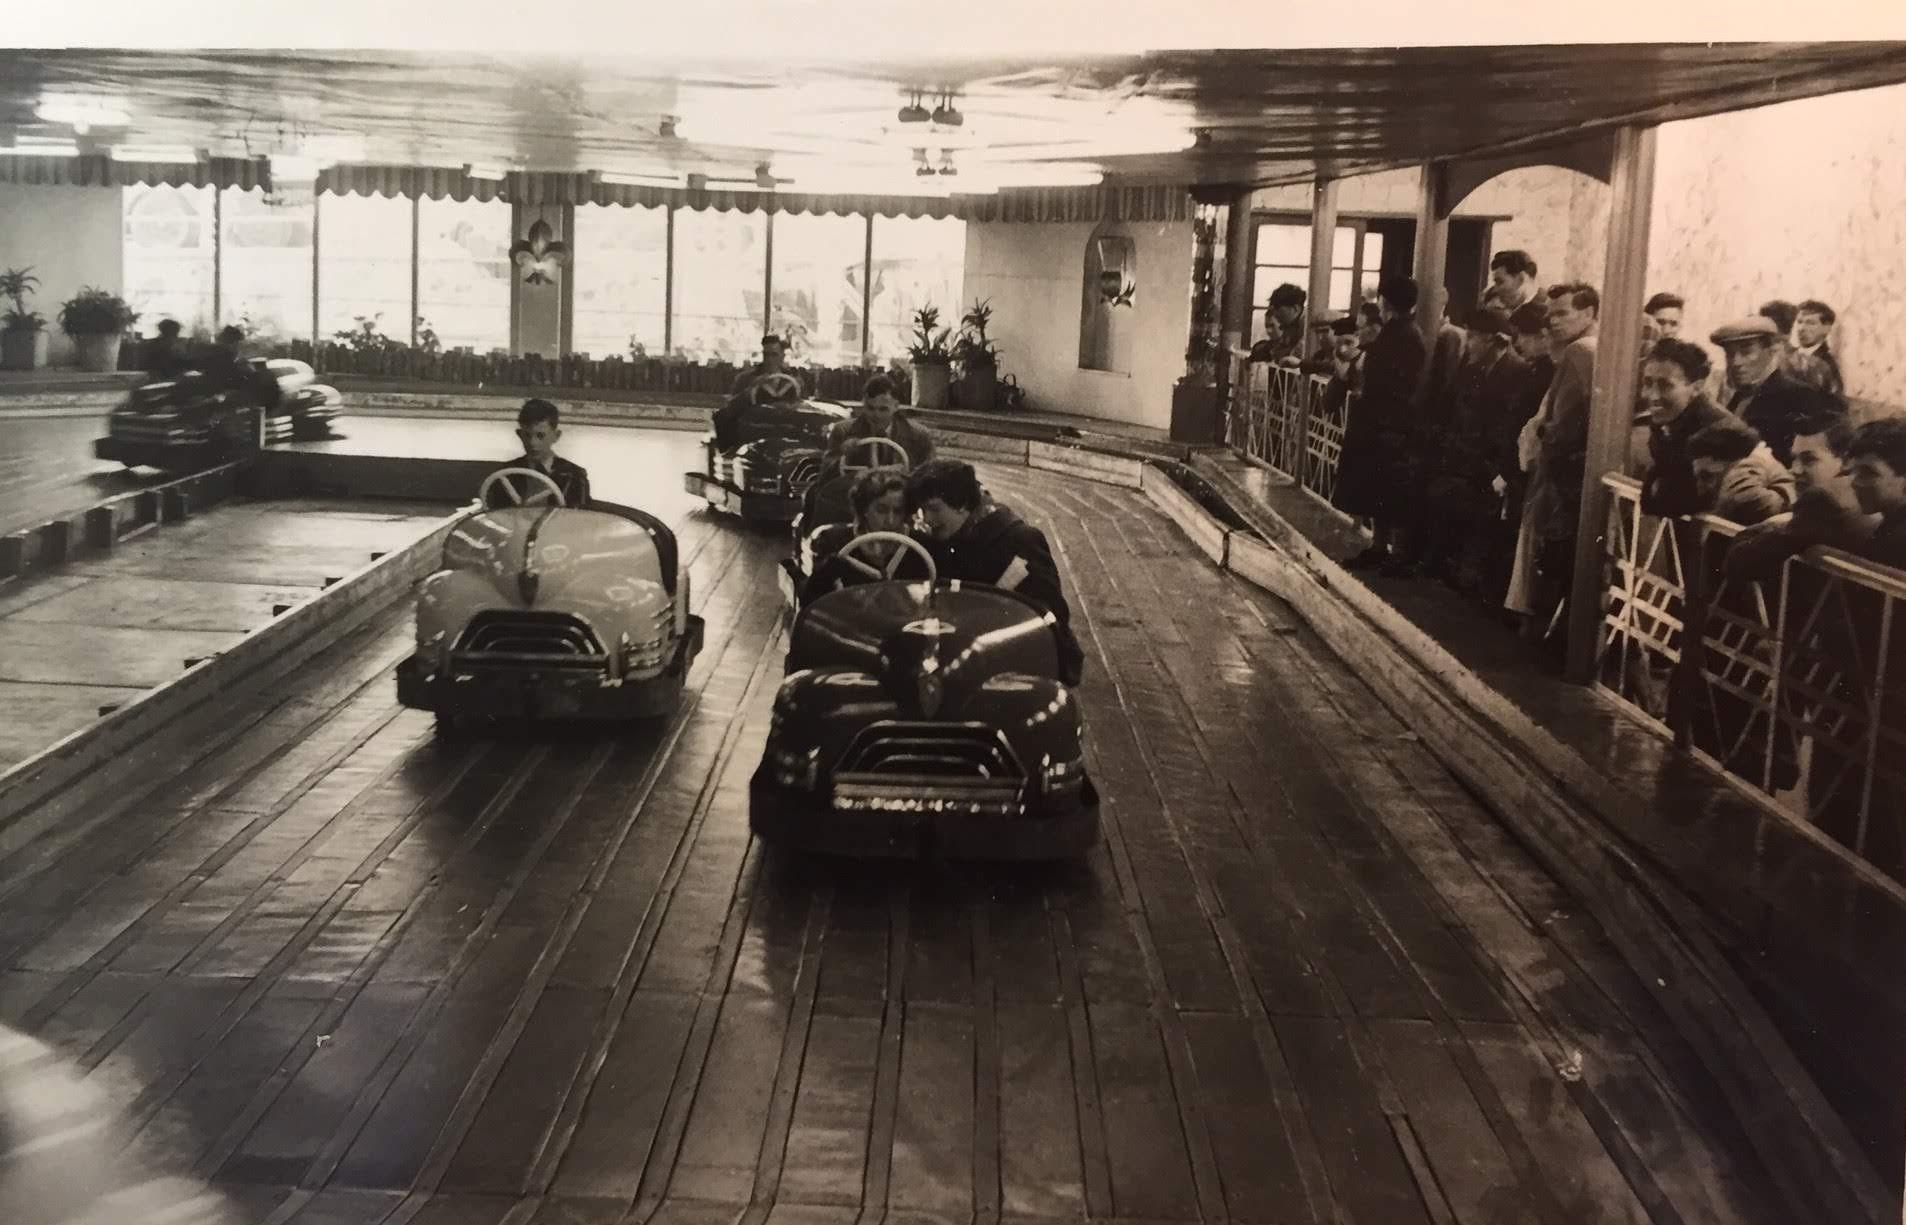 Barry's Racing Cars